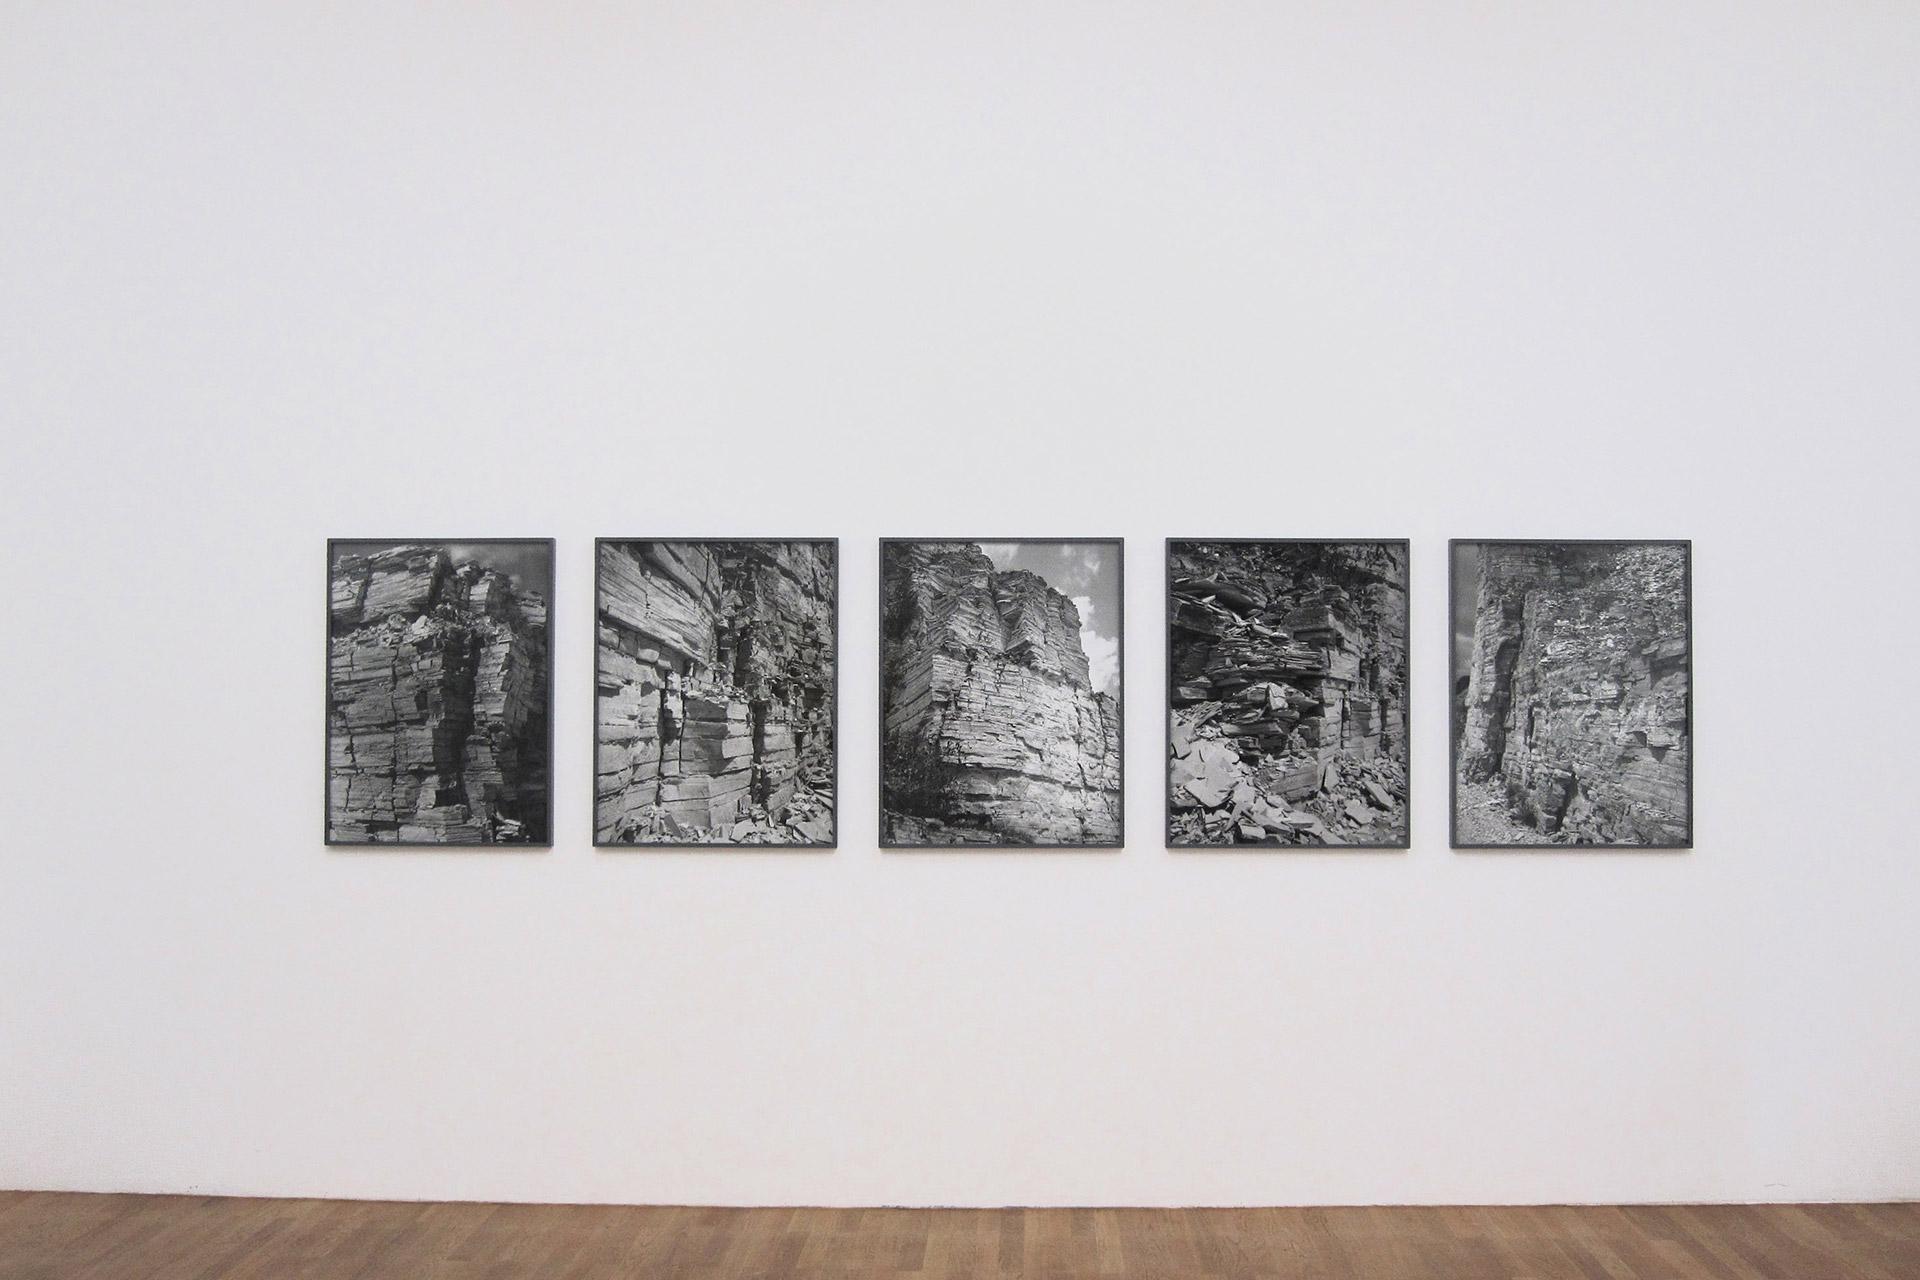 Susanne-Kriemann-Kunsthalle-Winterthur-2011-2.jpg